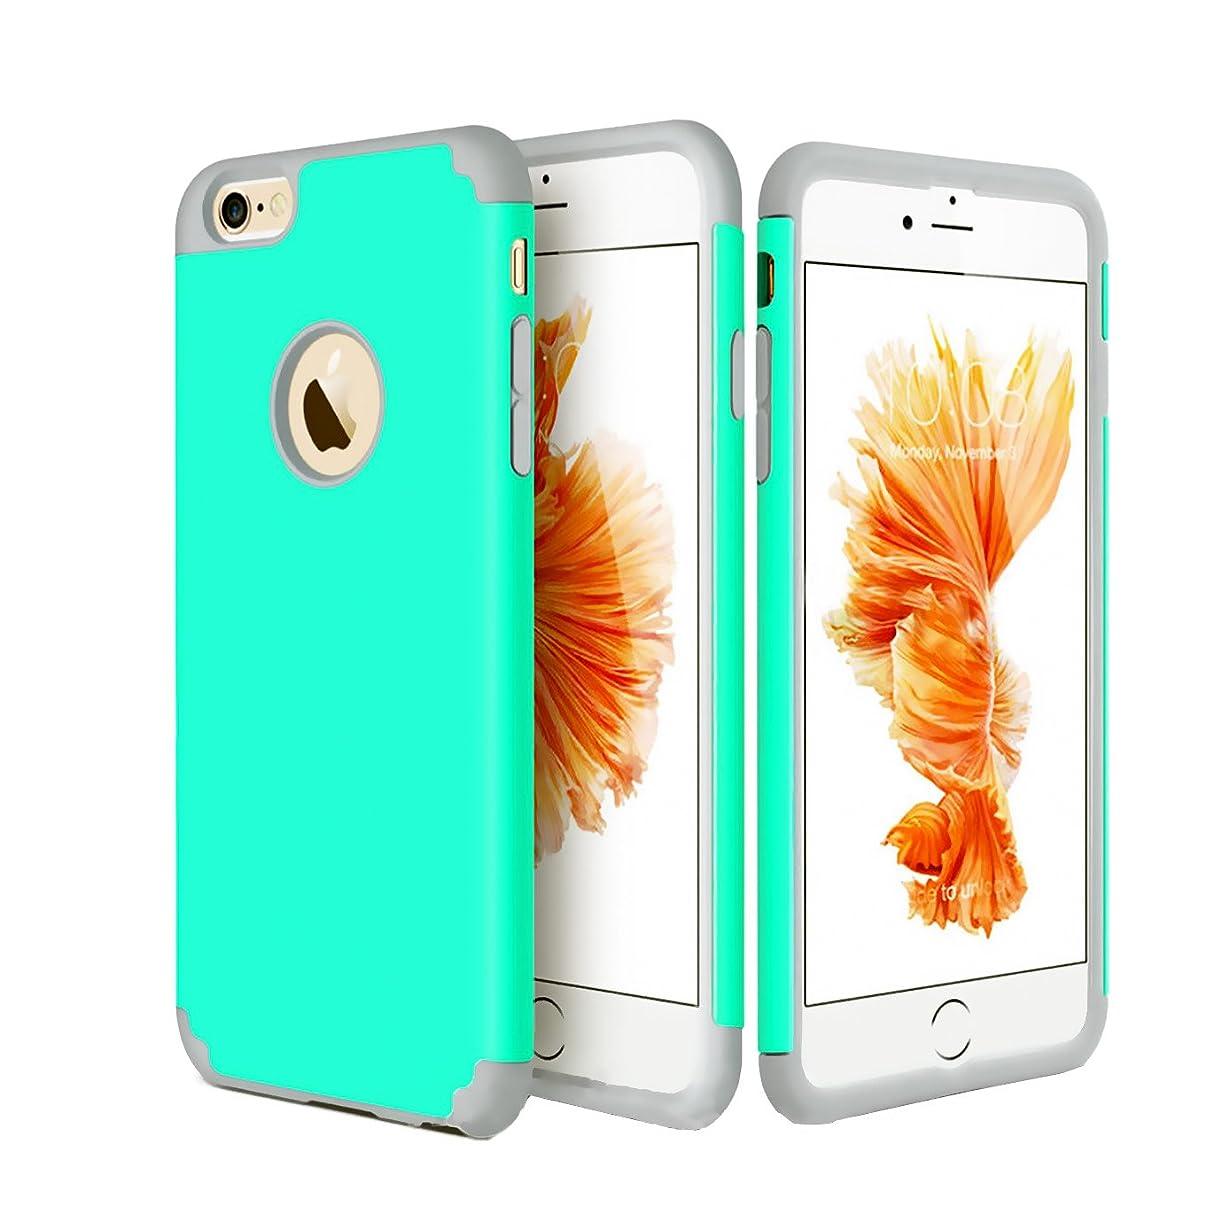 iPhone 6 Plus Case, iPhone 6s Plus case, iEugen Slim Fit Heavy Duty Cover Case,Anti Scratch Durable 2 in 1 Hybrid Hard PC & Soft Rubber TPU Full Protective for iPhone 6 Plus/iPhone 6s Plus(Teal)